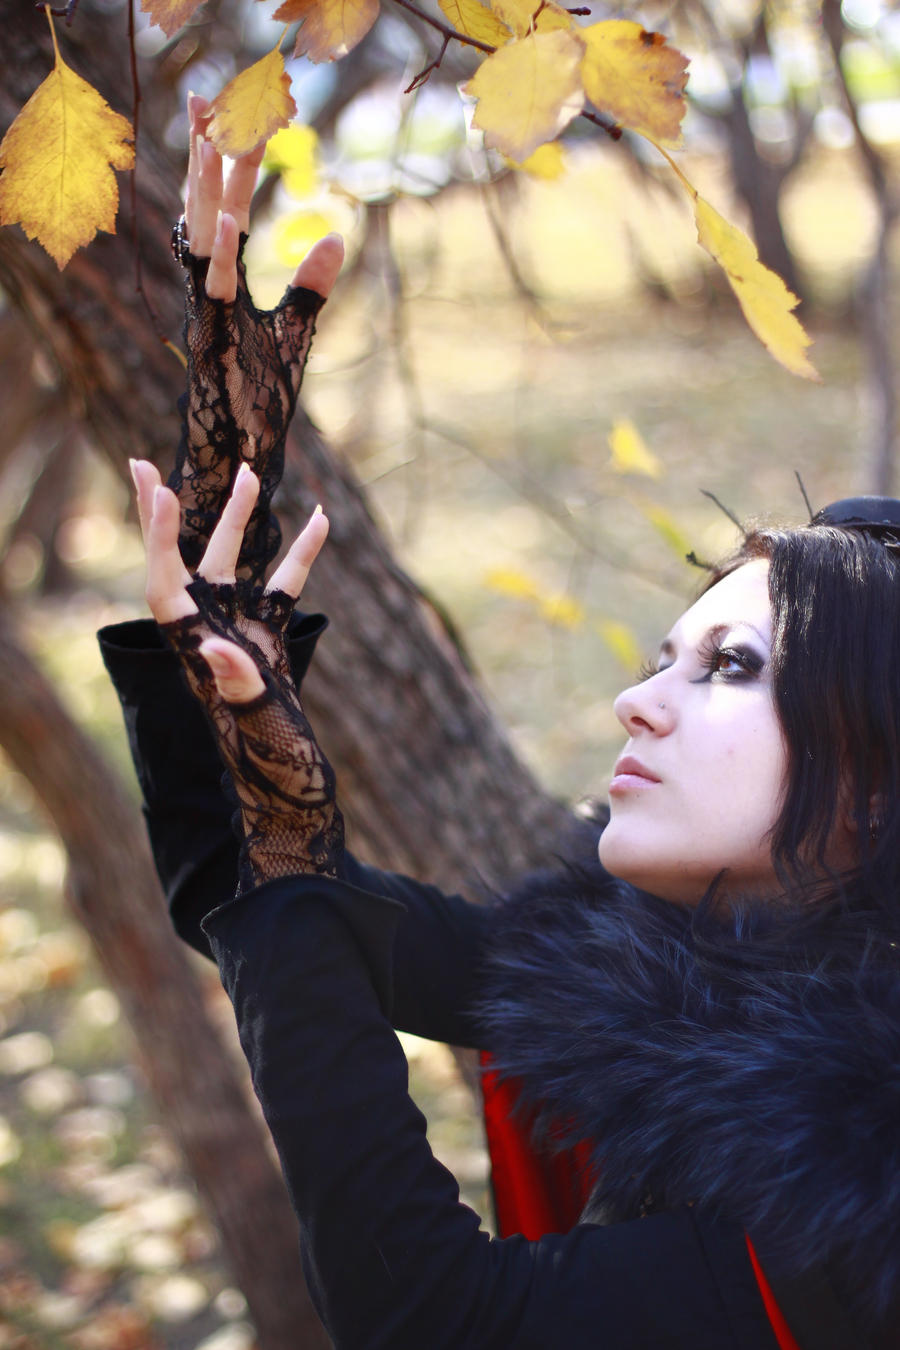 goth_4 by MysteriaViolentStock